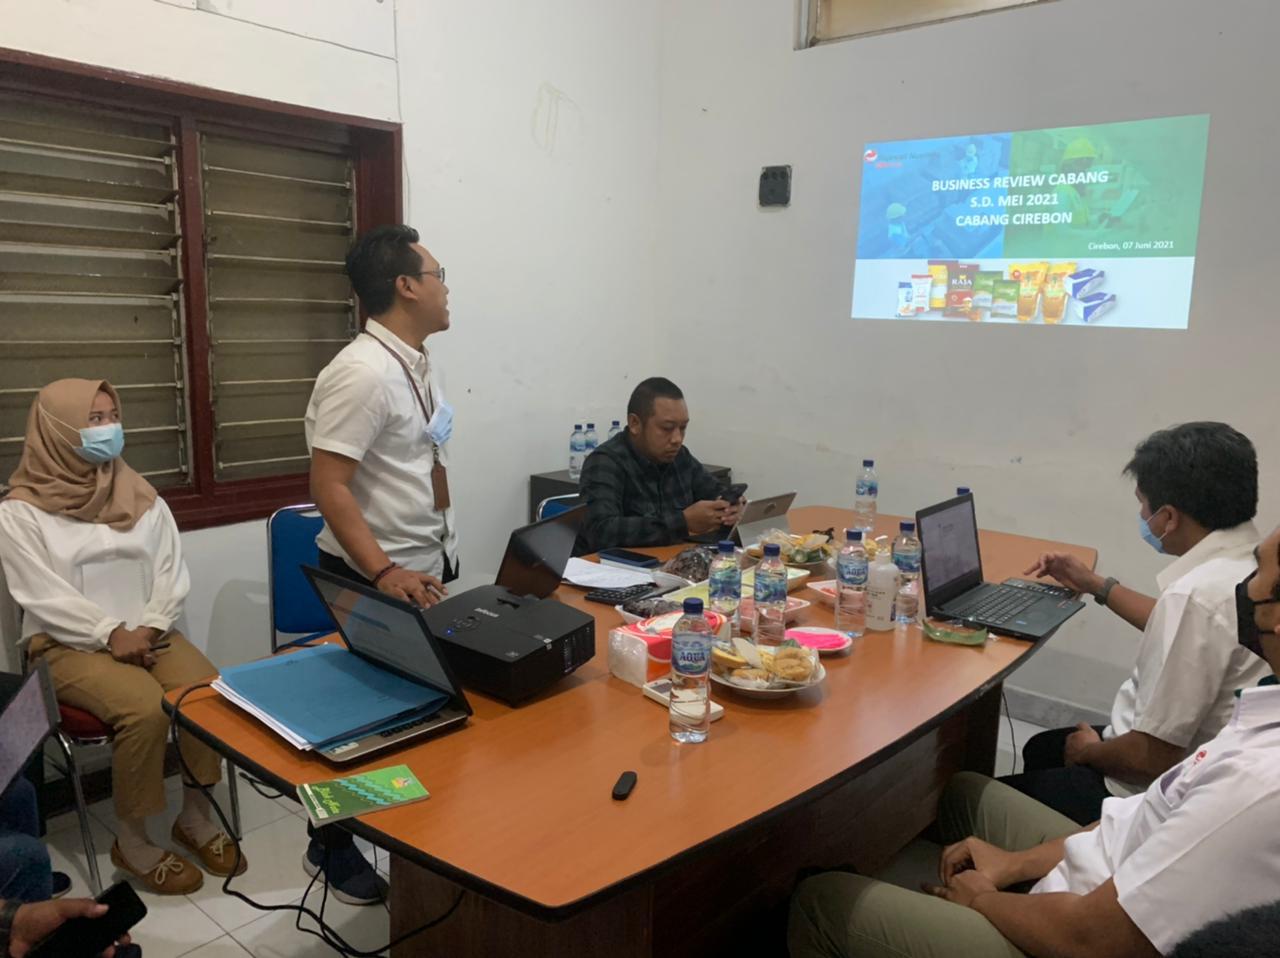 Cabang Cirebon Lakukan Business Review